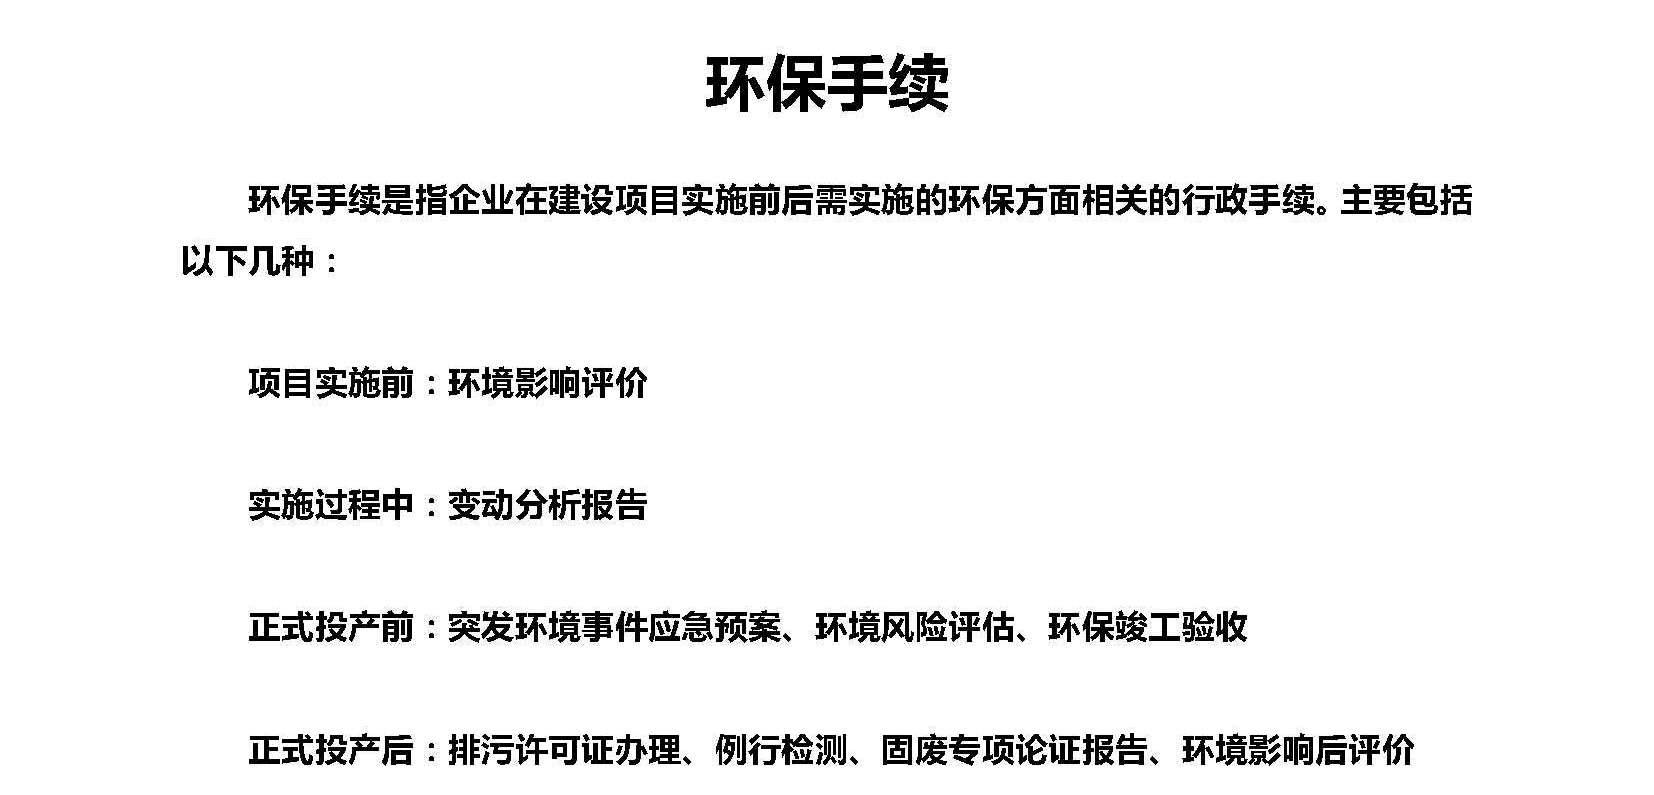 lovebet爱博下载手续 文字材料_页面_2